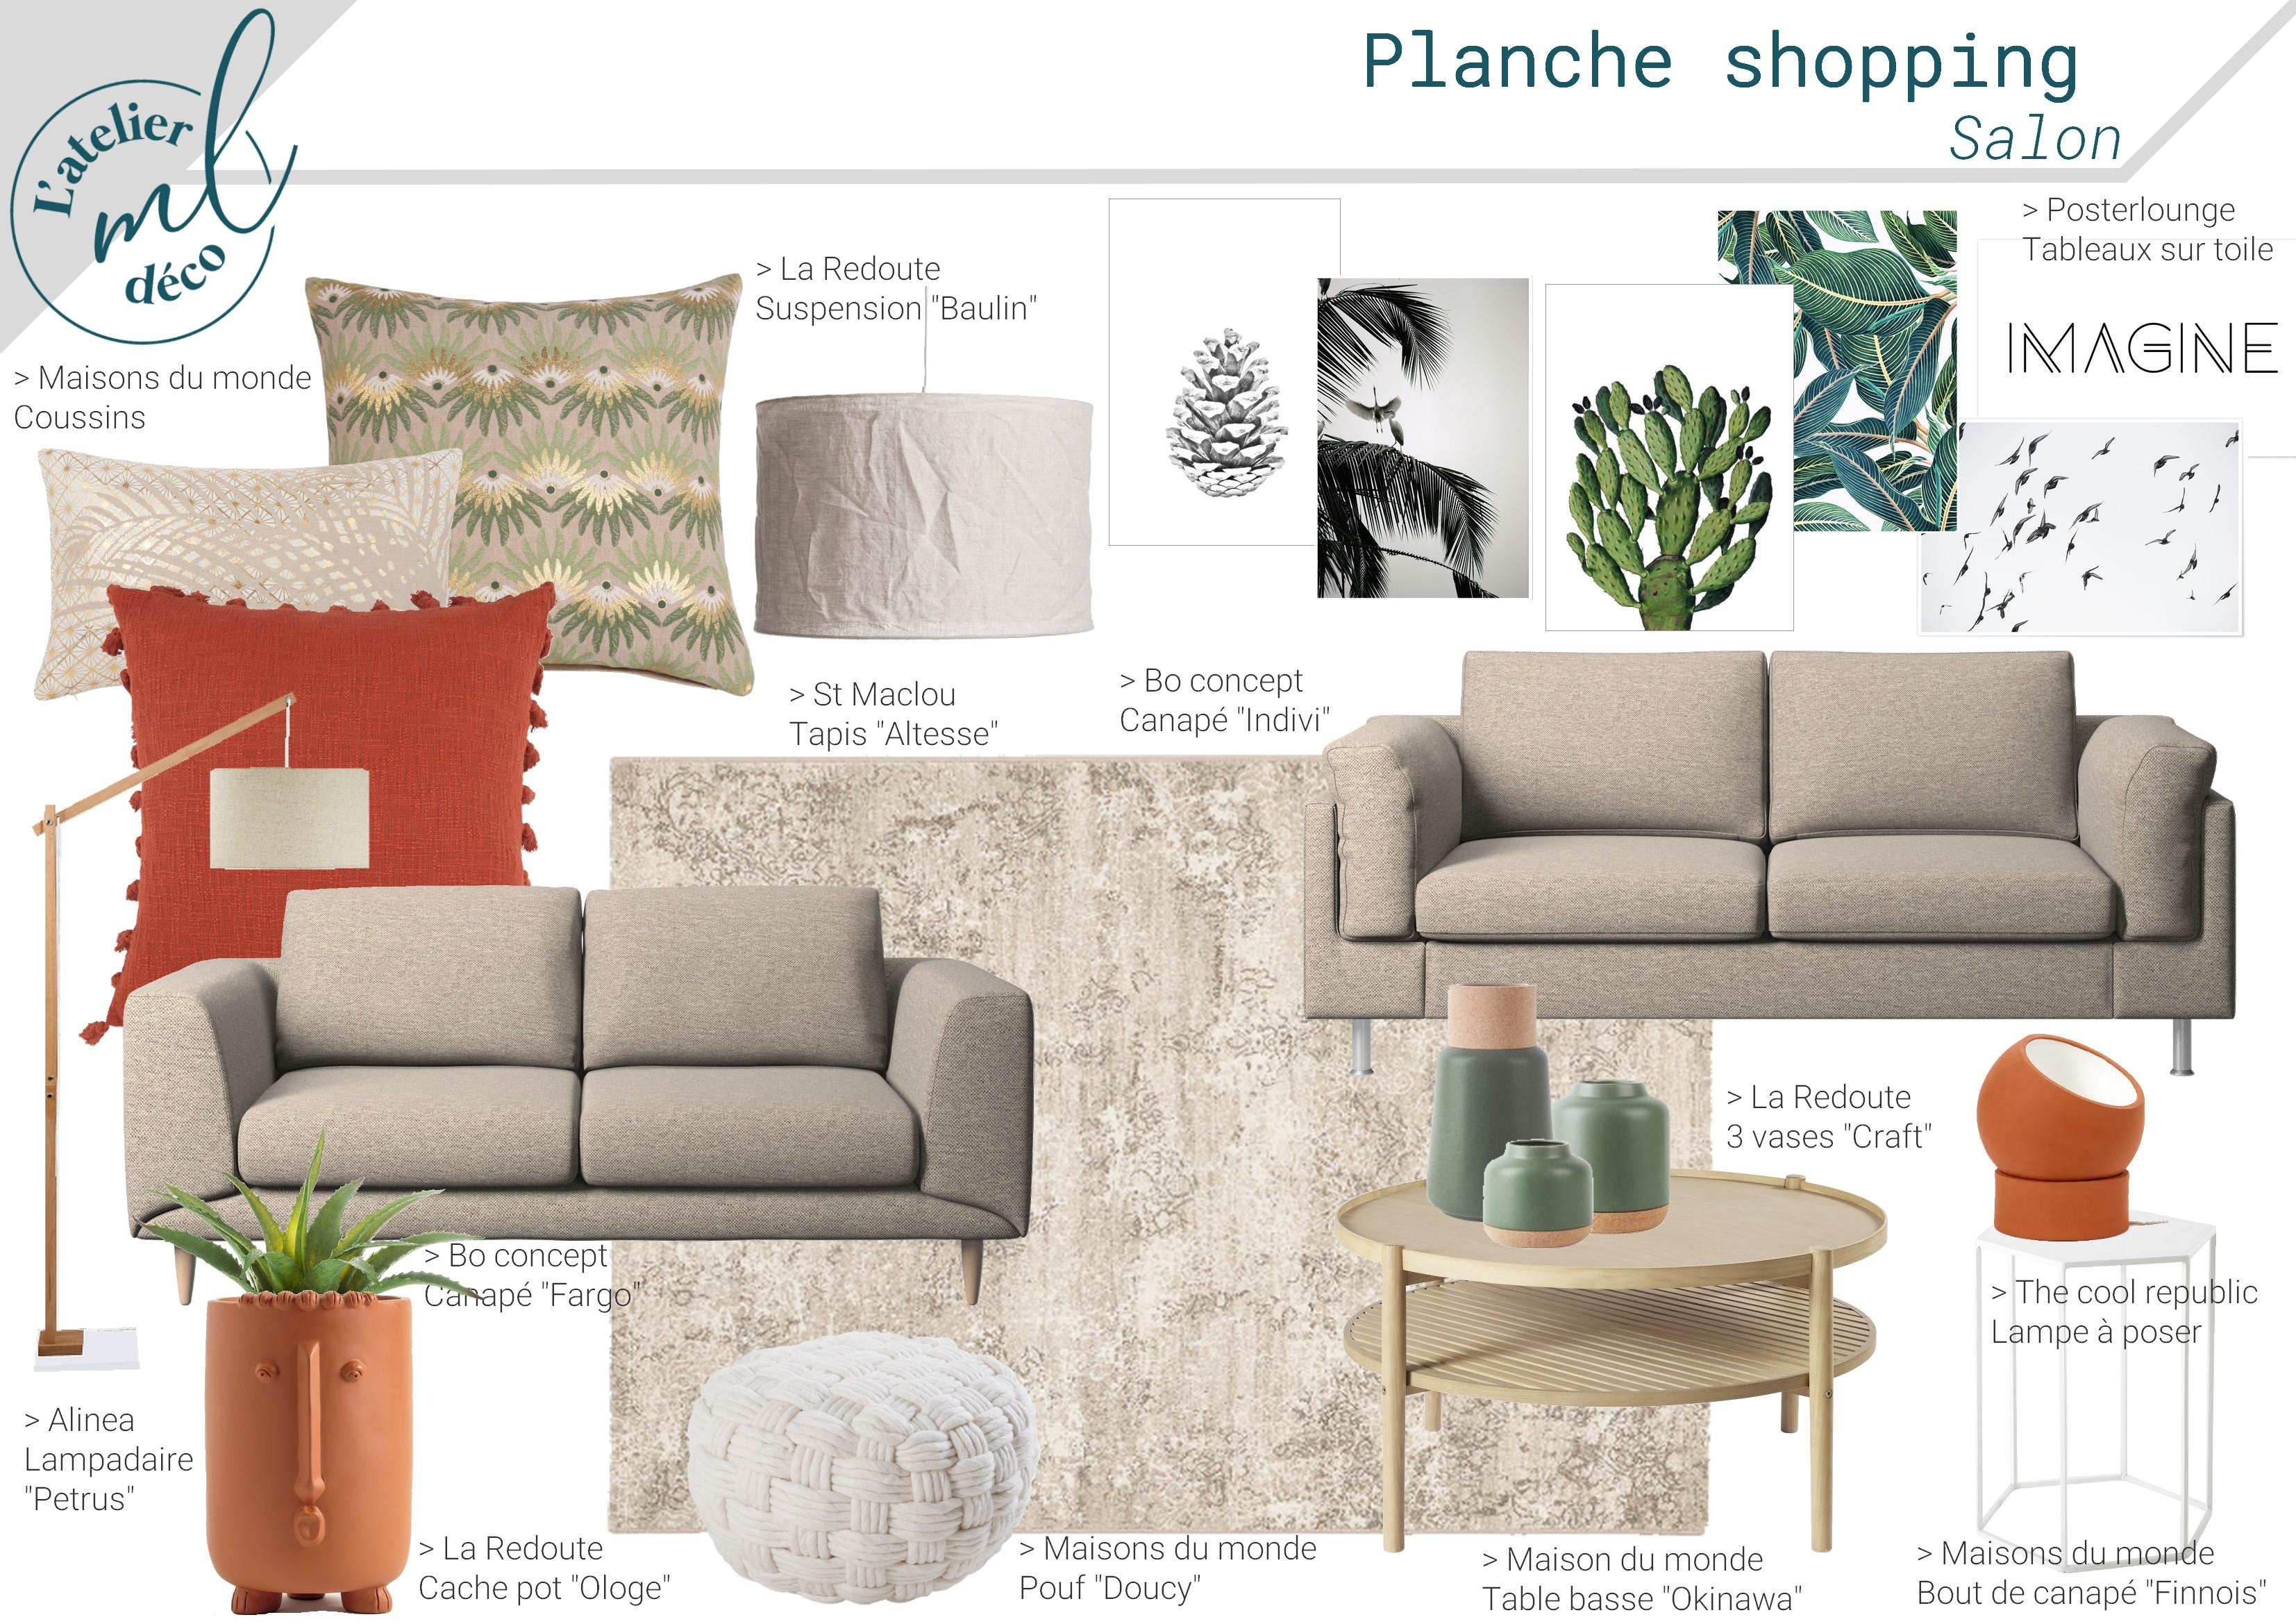 Planche shopping - Salon